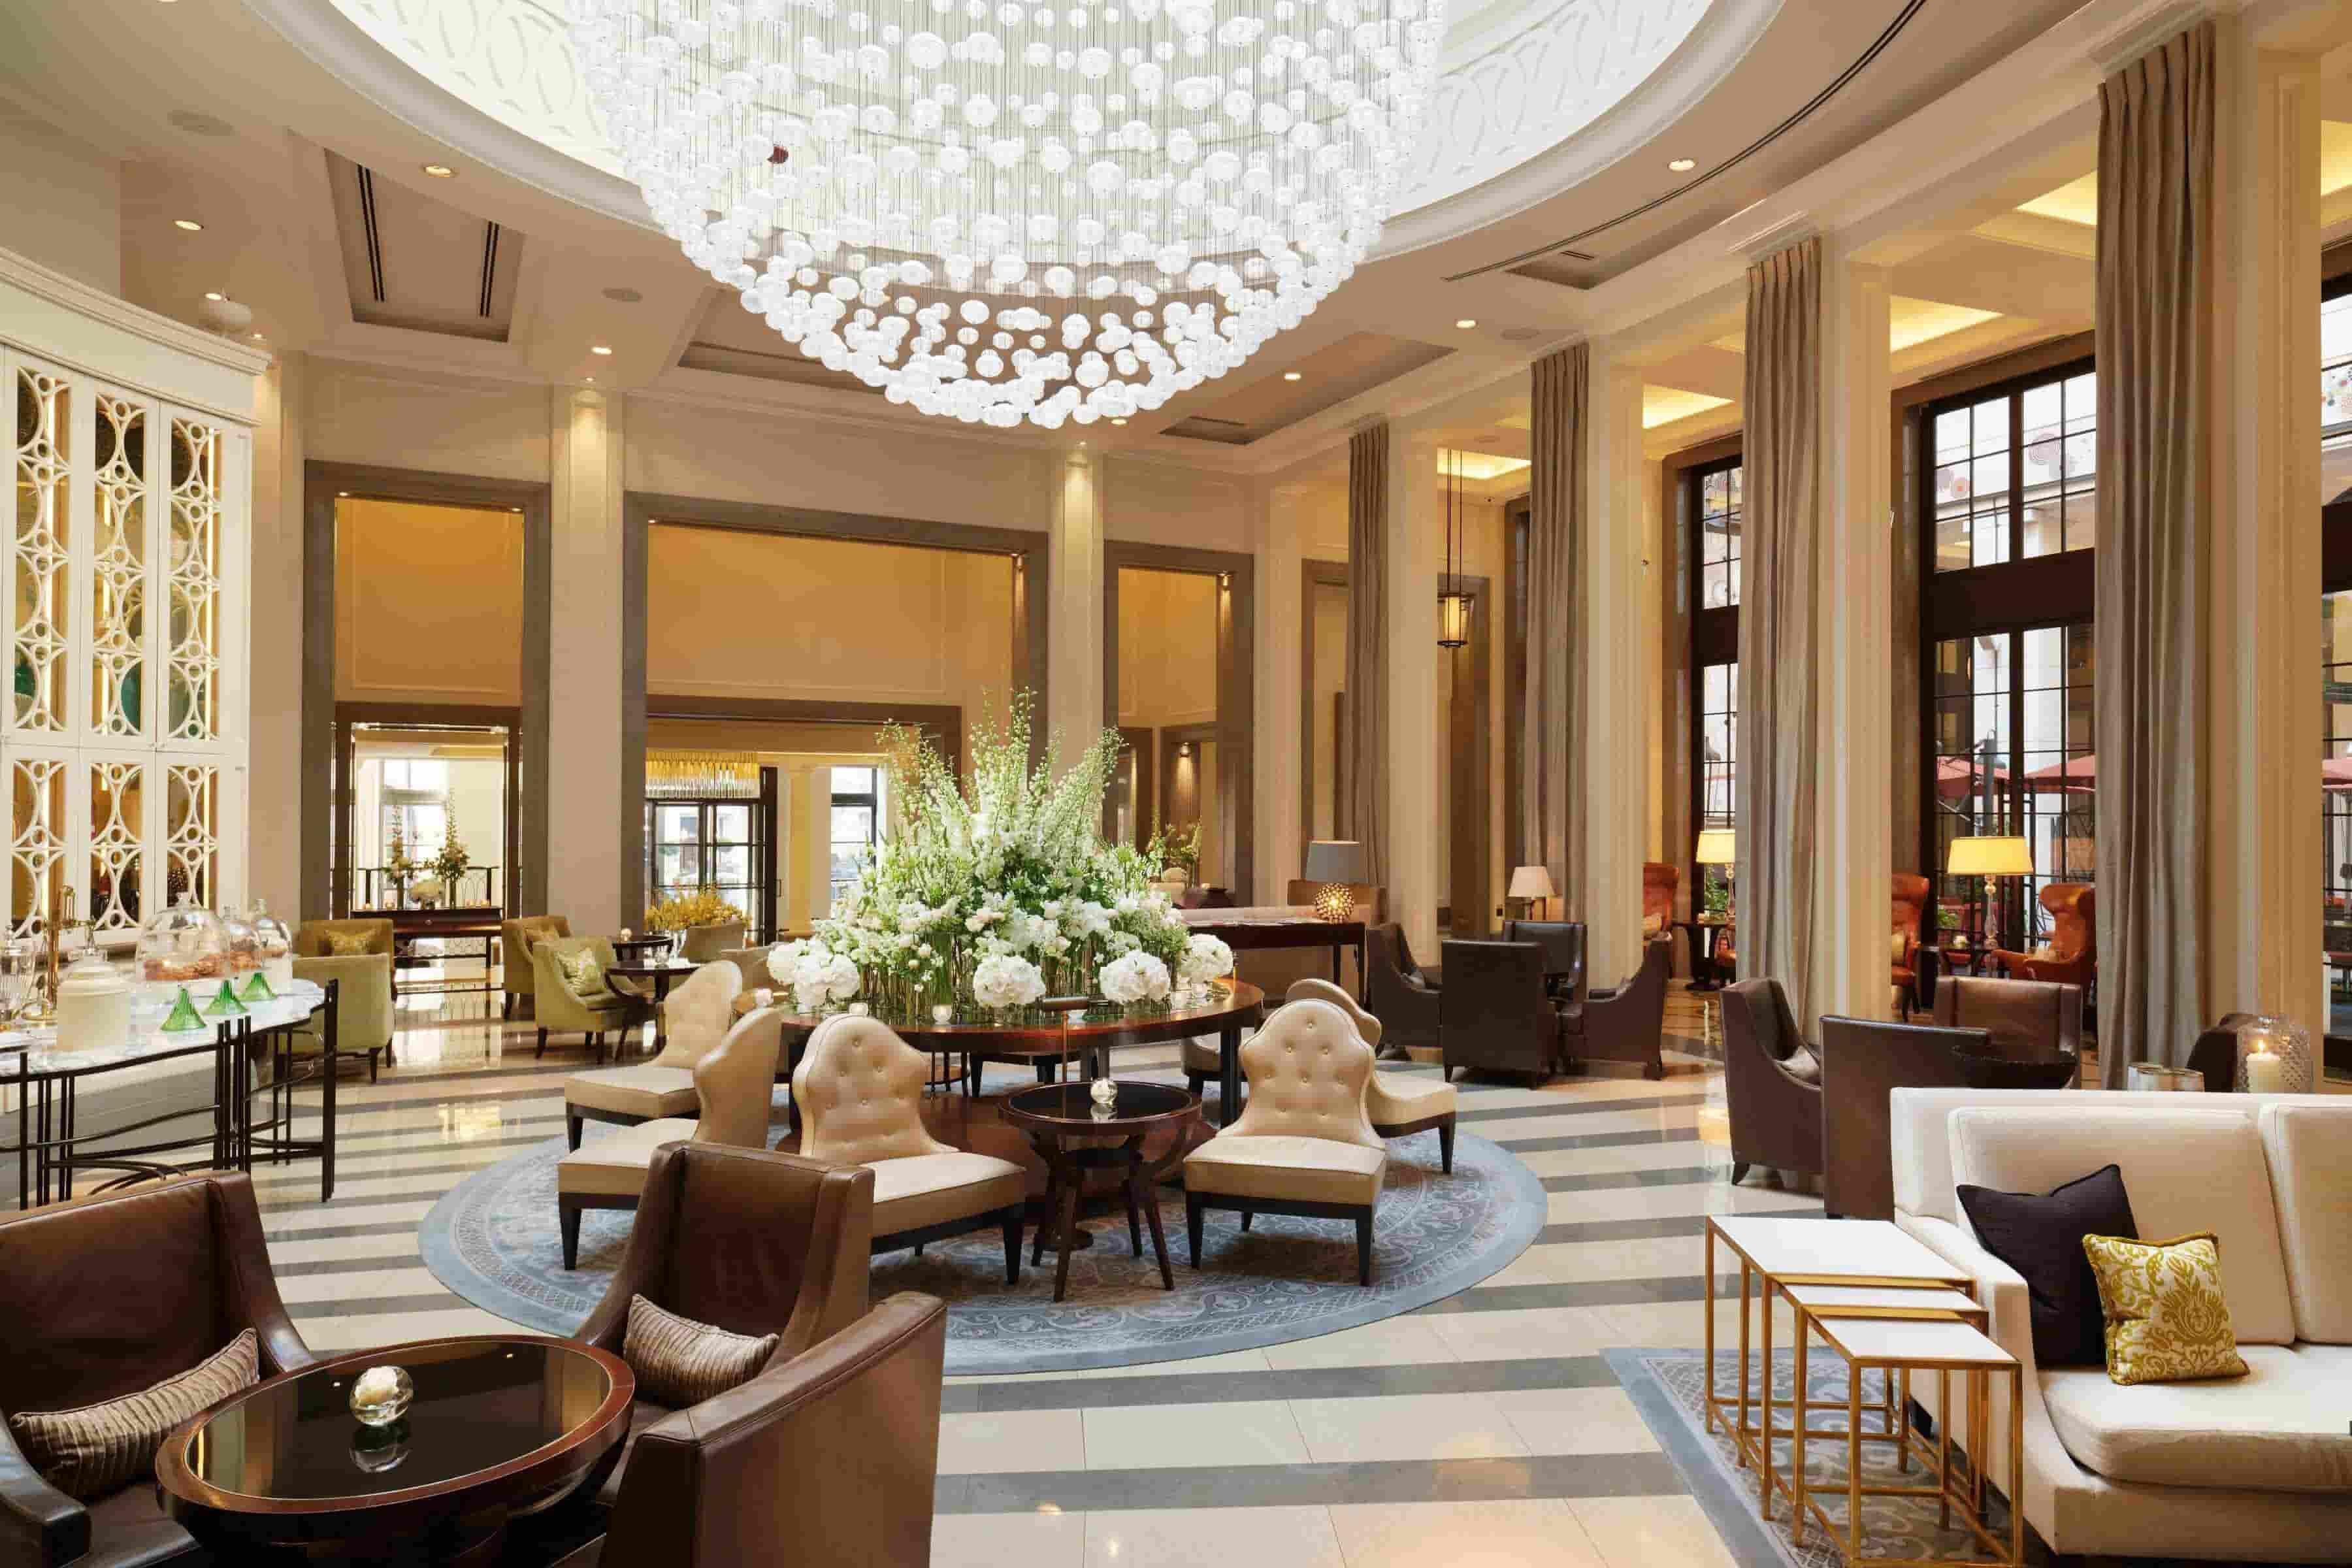 Corinthia Hotel (London)